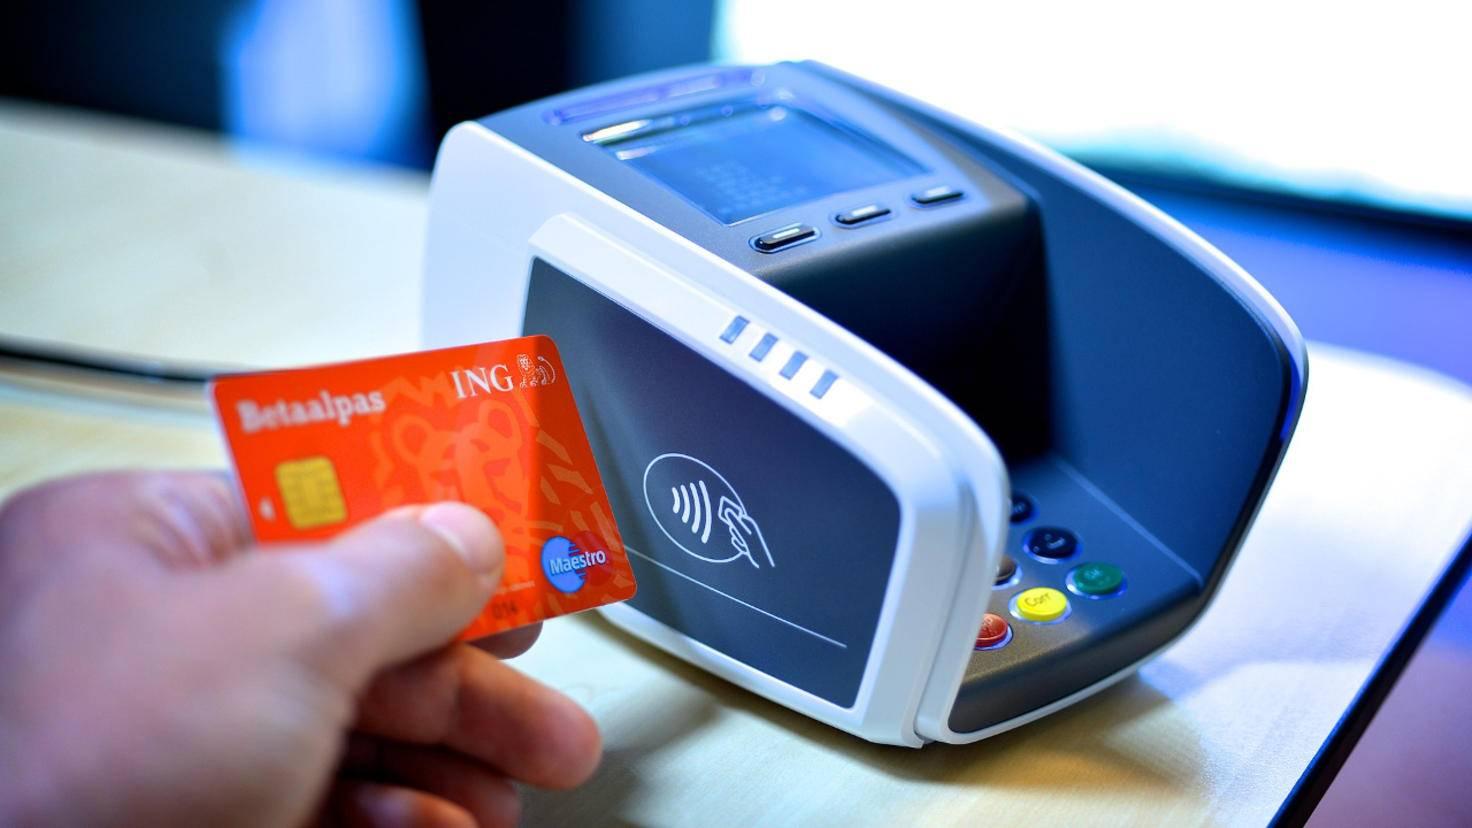 Kontaktloses-Bezahlen-NFC-Symbol